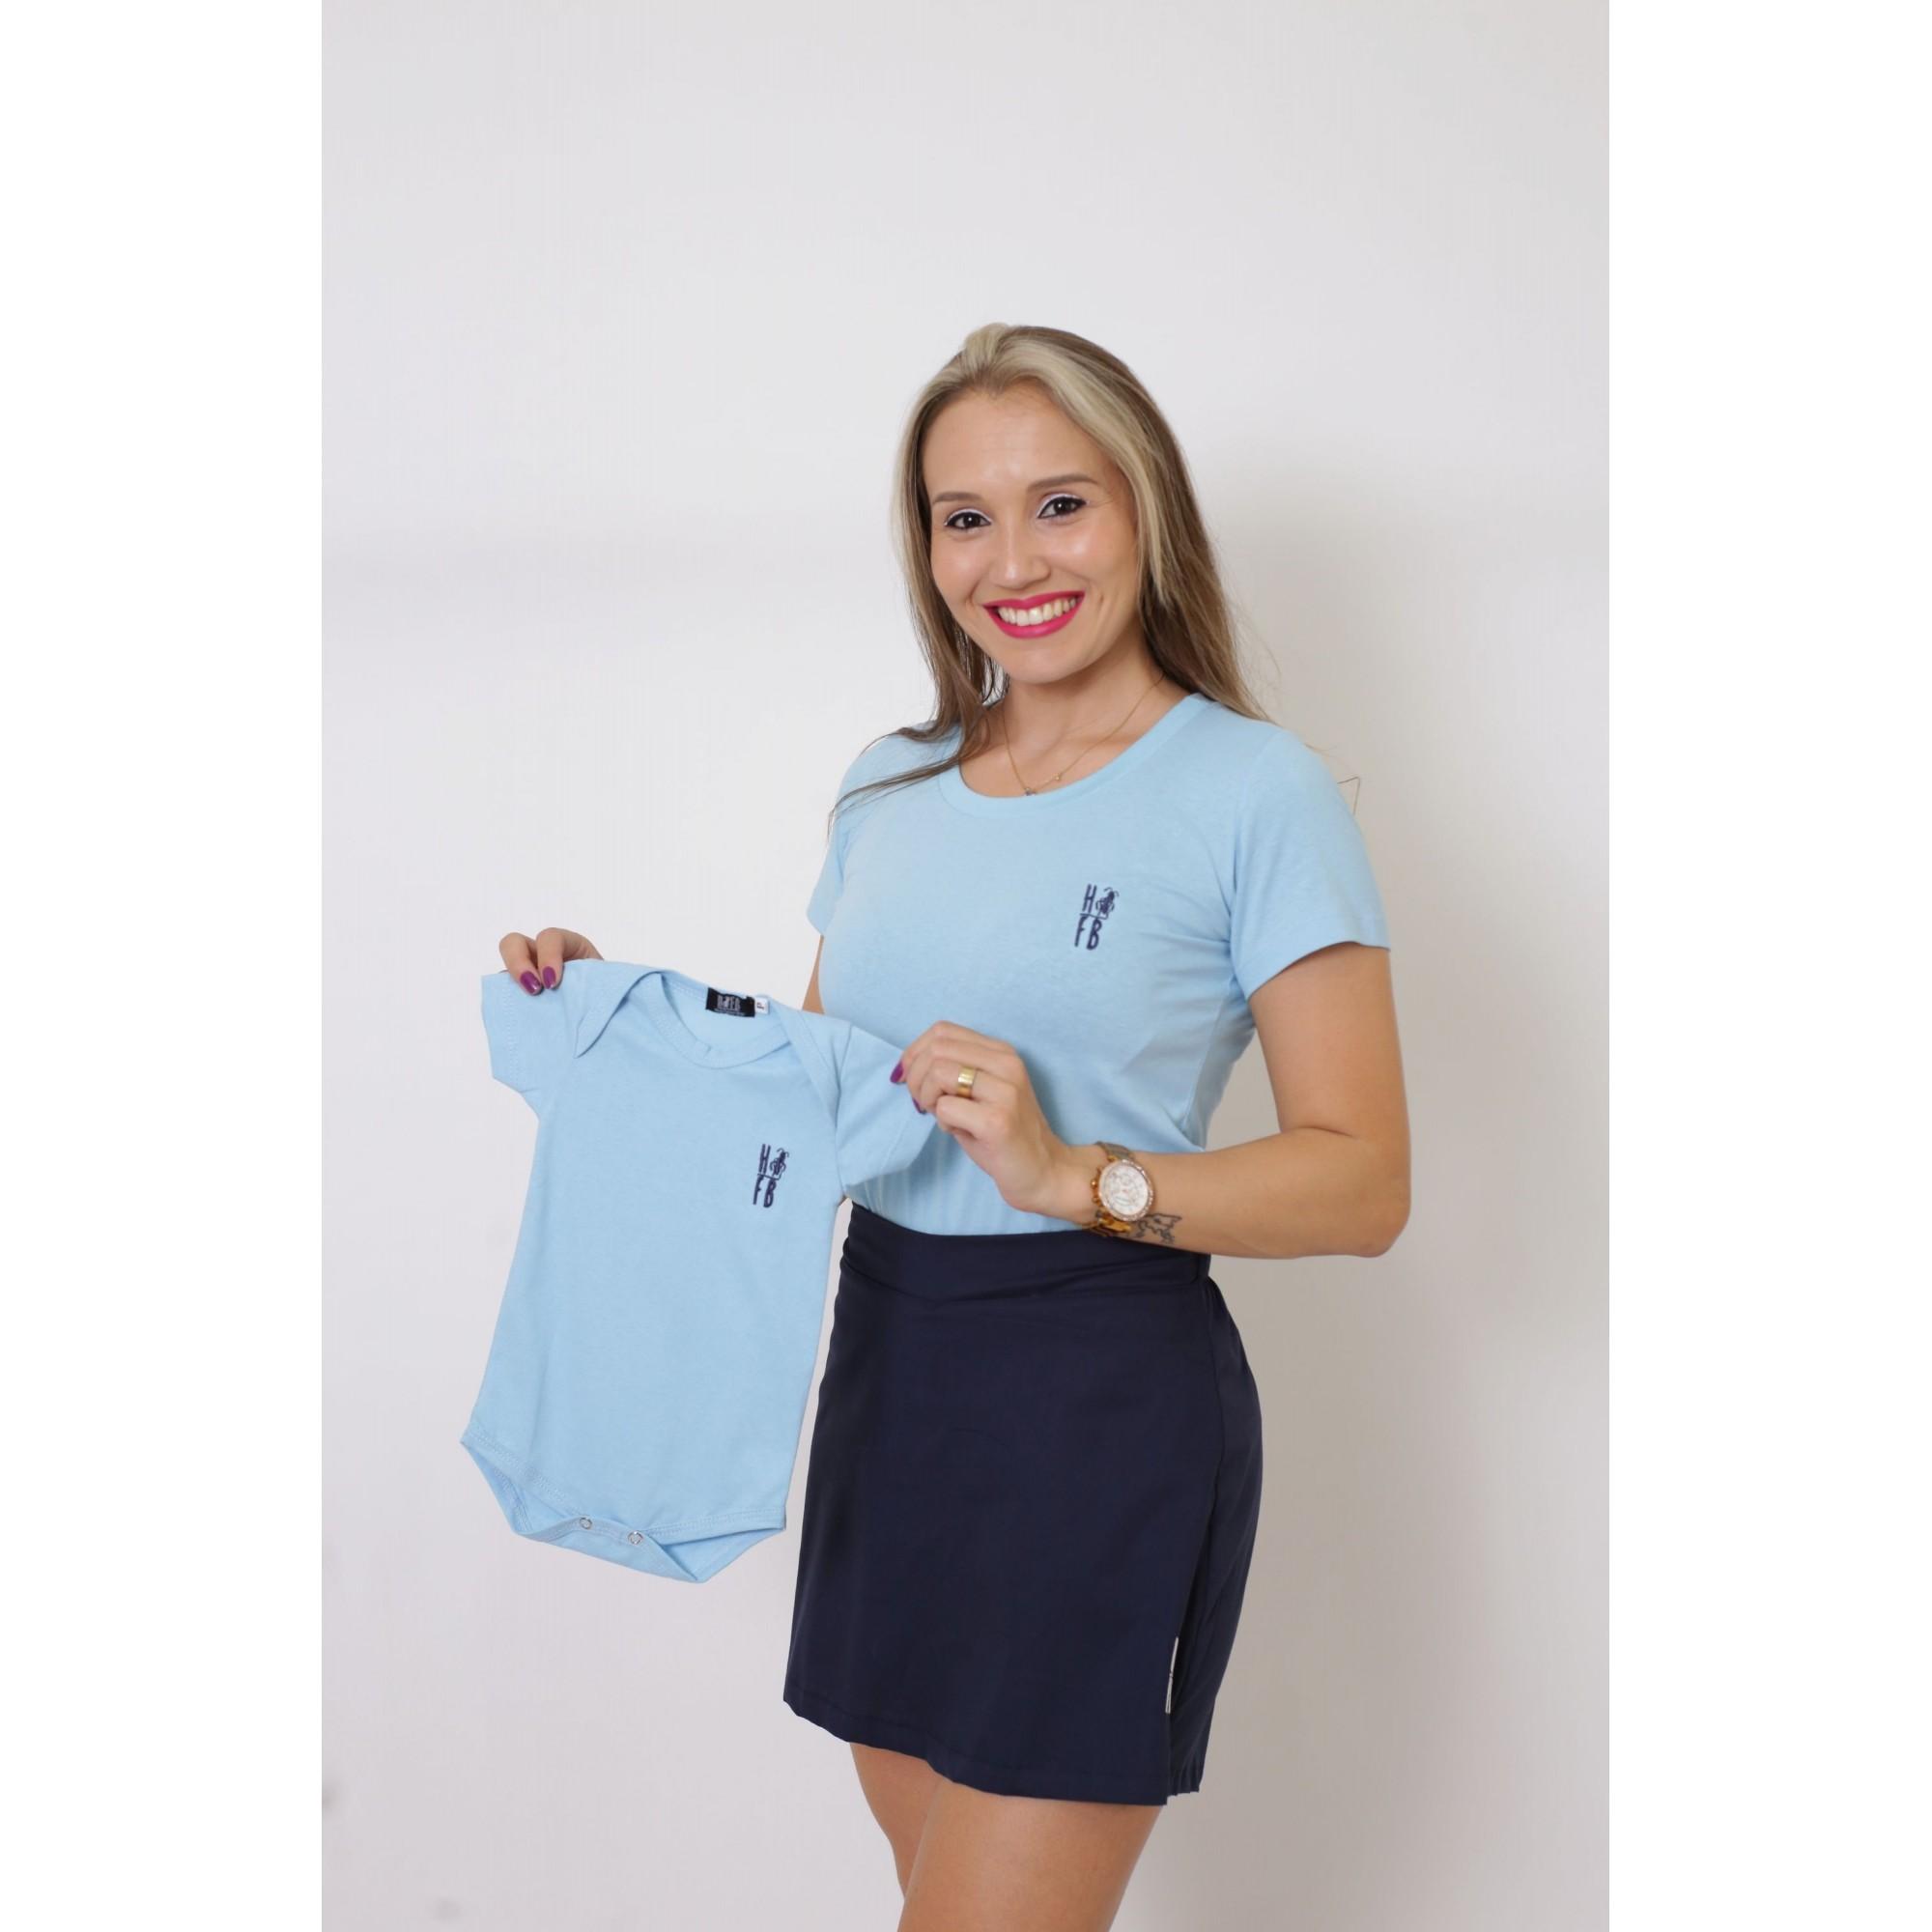 MÃE E FILHO > Kit 02 Peças - T-Shirts ou Body Azul Bebê [Coleção Tal Mãe Tal Filho]  - Heitor Fashion Brazil